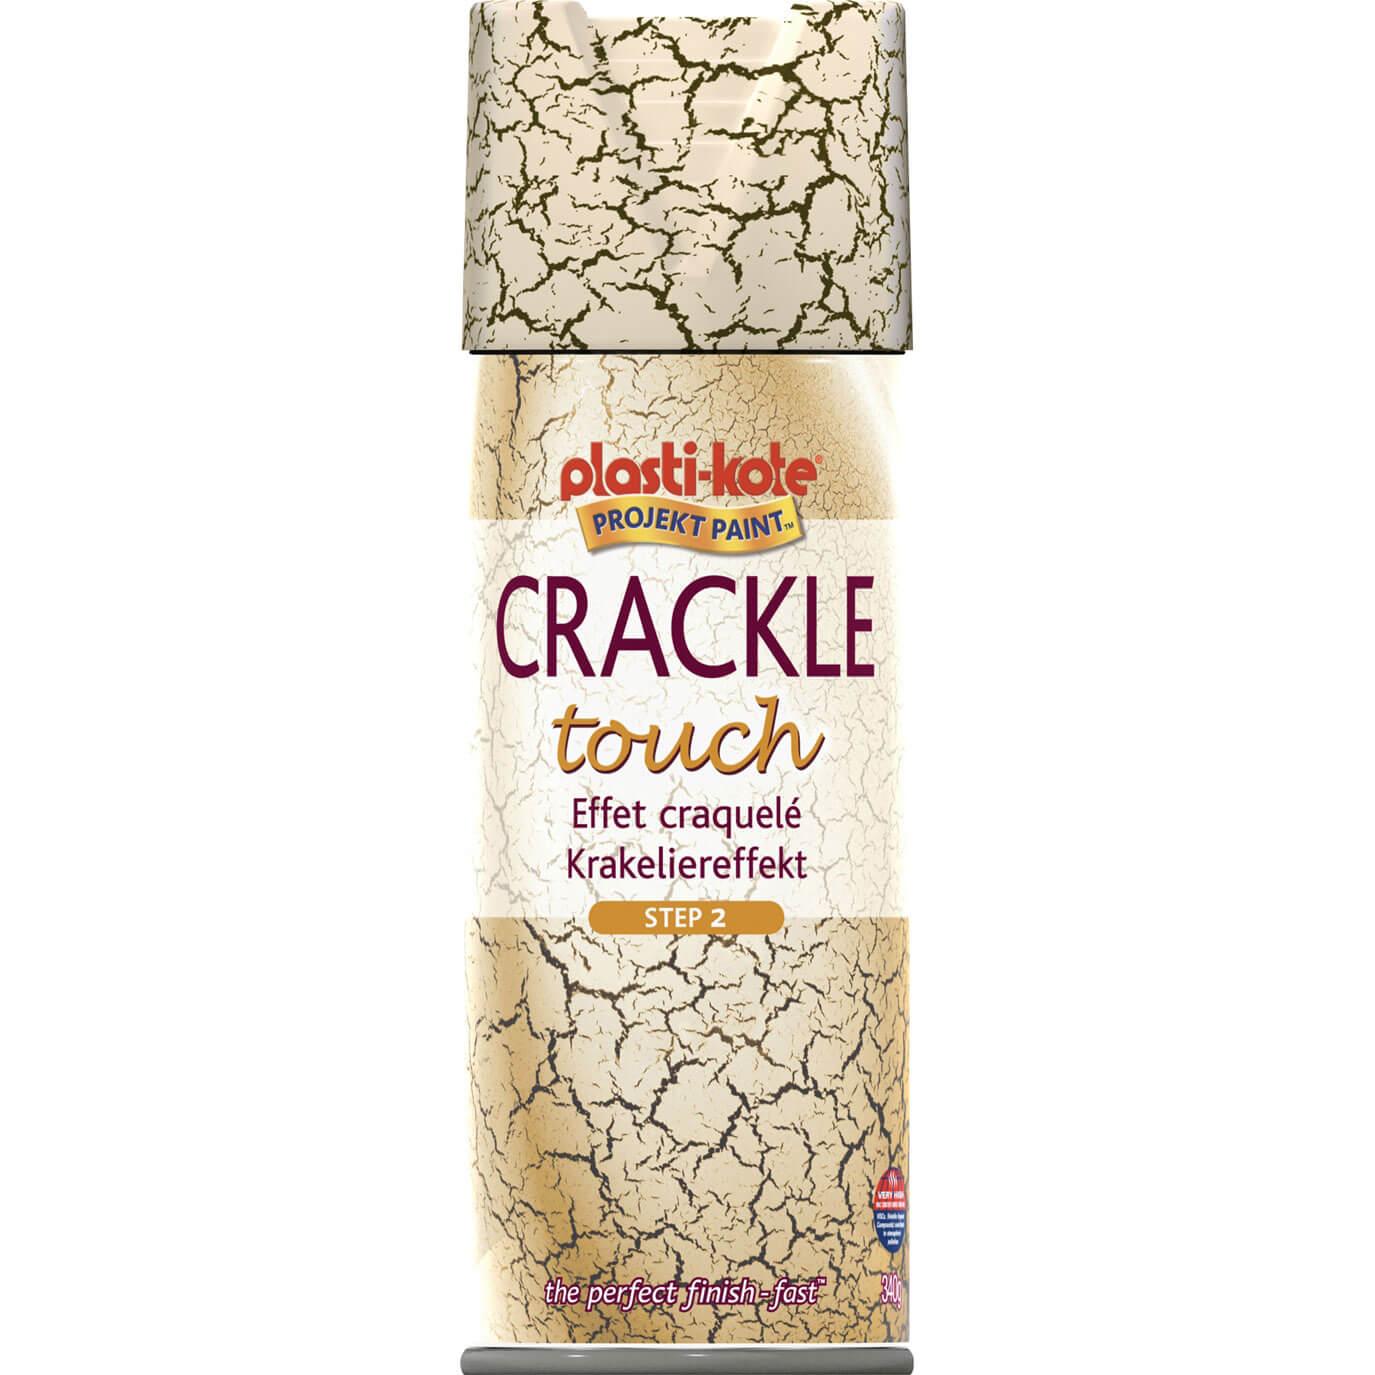 plastikote crackle touch antique look base coat aerosol spray paint. Black Bedroom Furniture Sets. Home Design Ideas